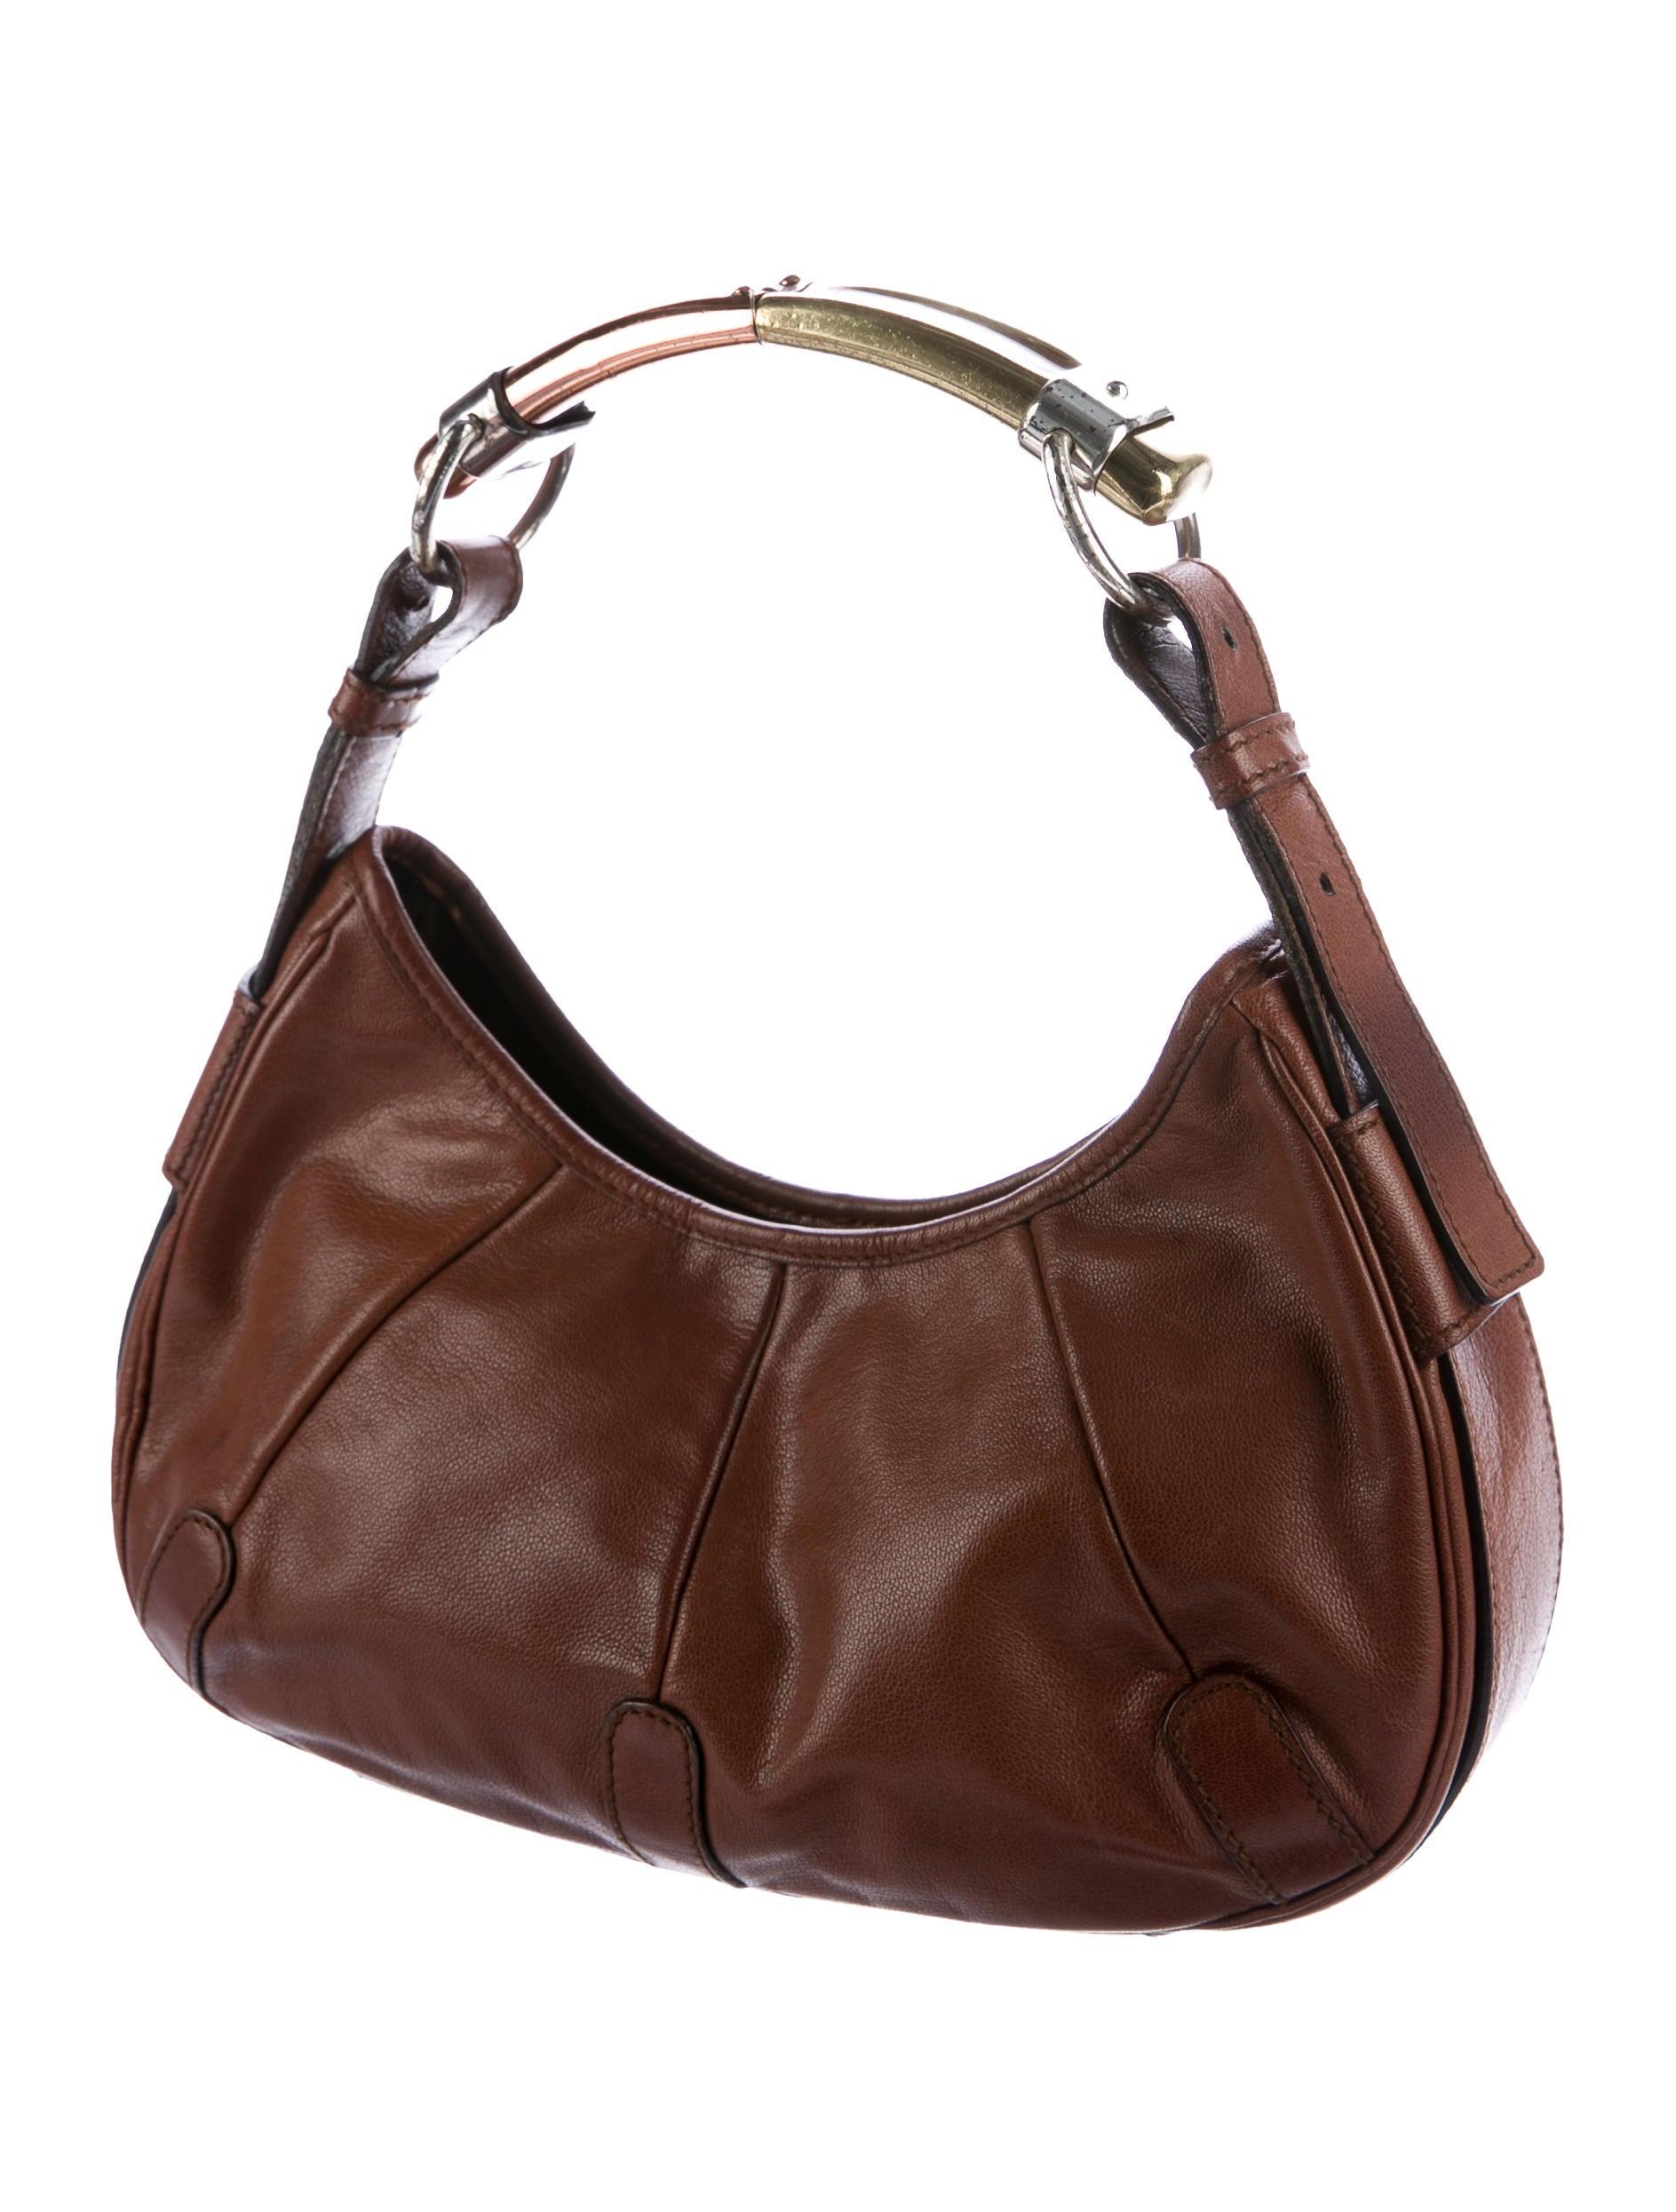 yves saint laurent leather mombasa bag handbags yve67461 the realreal. Black Bedroom Furniture Sets. Home Design Ideas